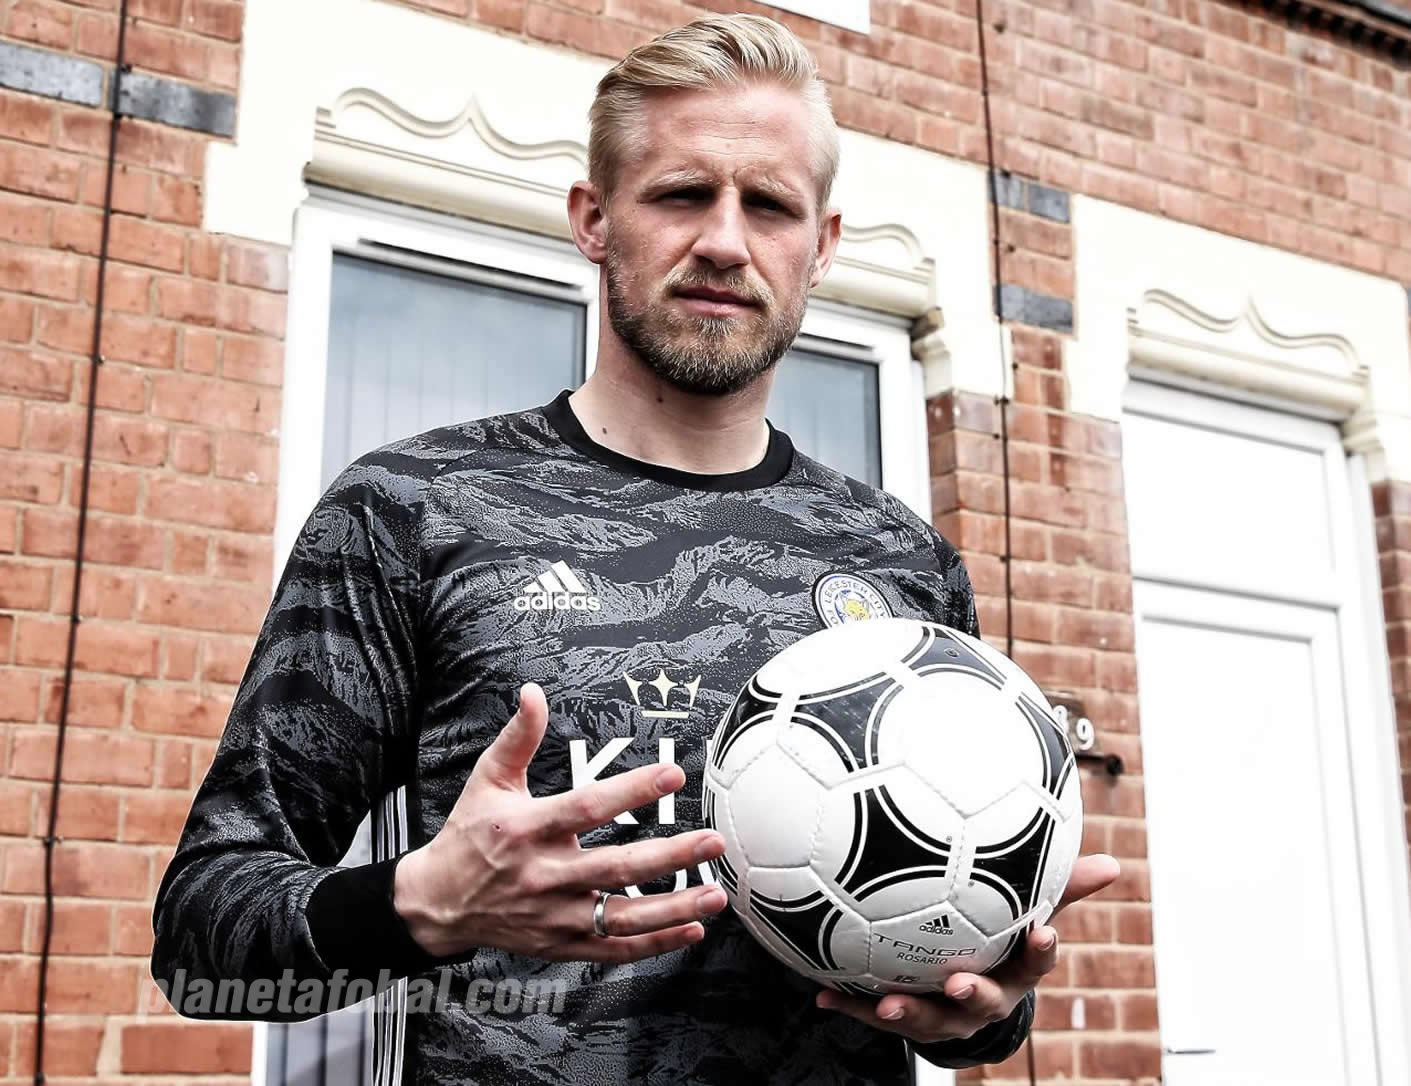 Camiseta de arquero Adidas del Leicester City 2019/20 | Imagen Web Oficial